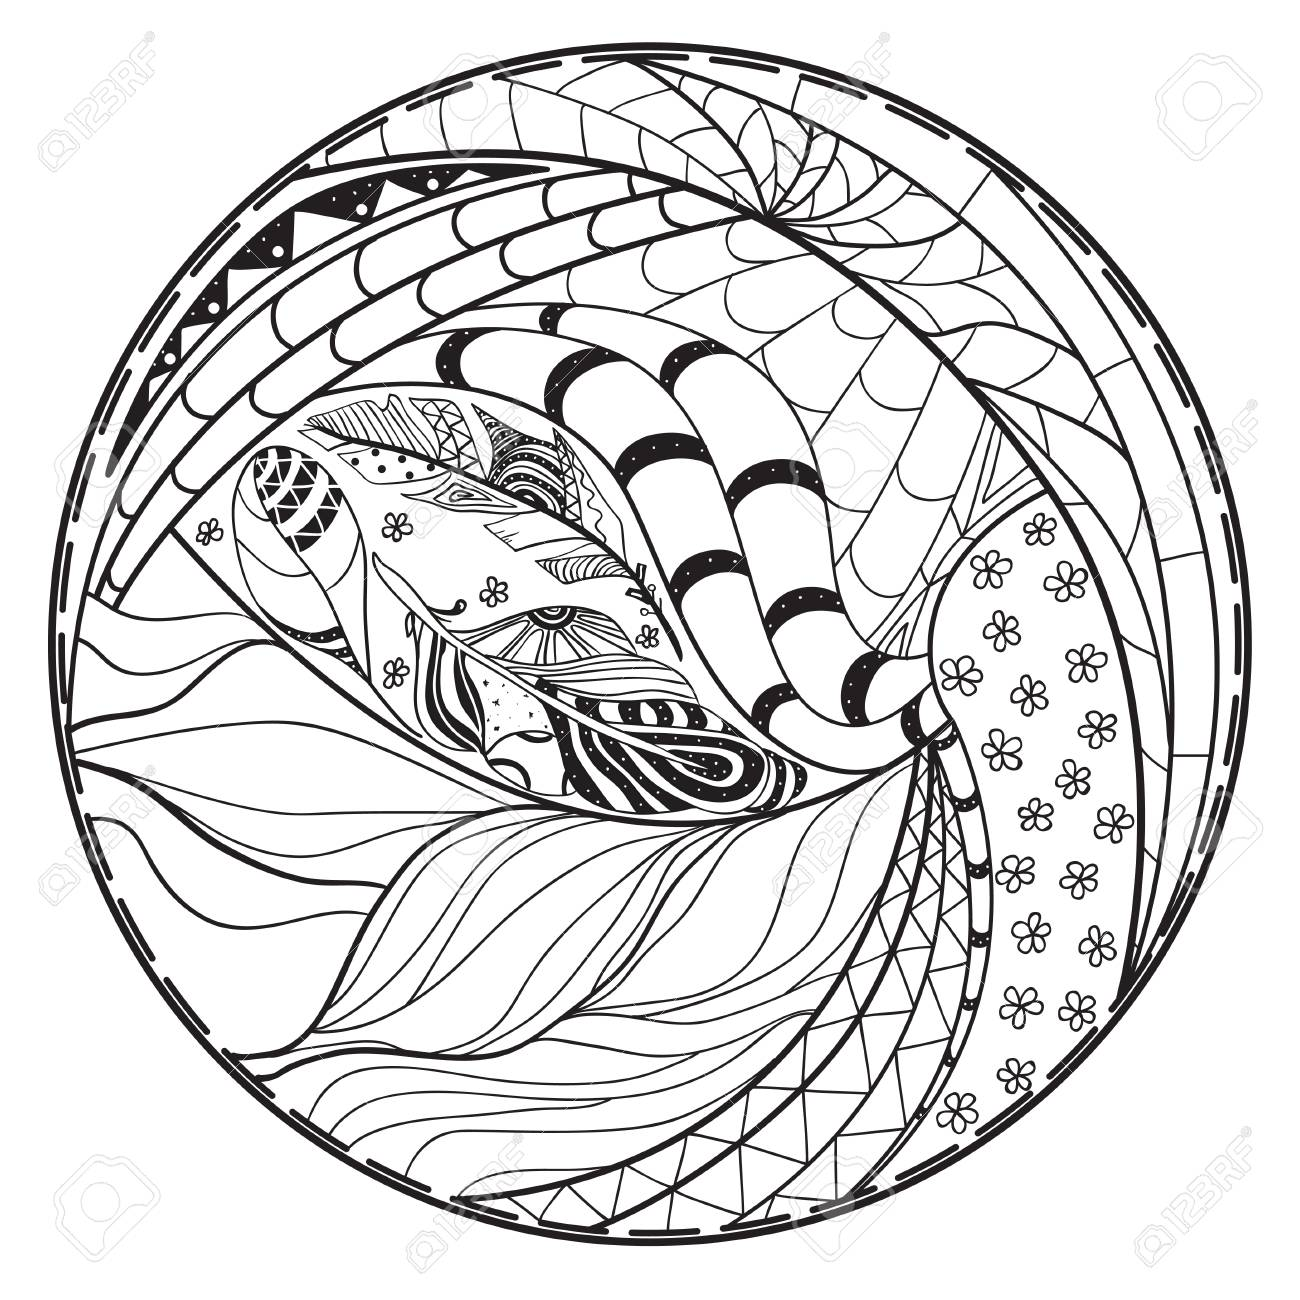 Zendala. Zentangle. Mano Círculo Dibujado Mandala Con Modelos ...